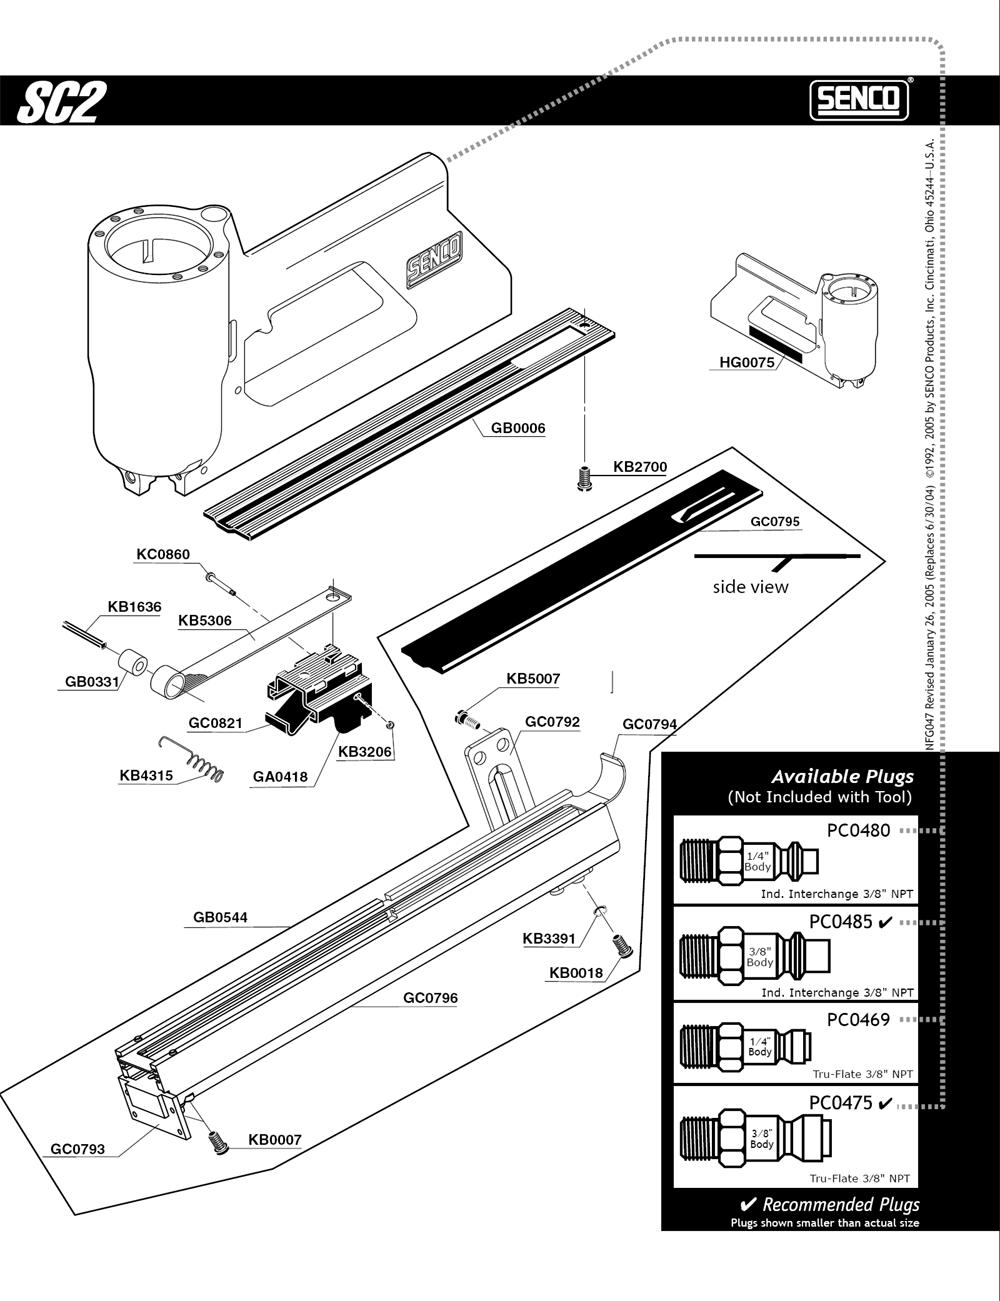 470001N-senco-PB-1Break Down